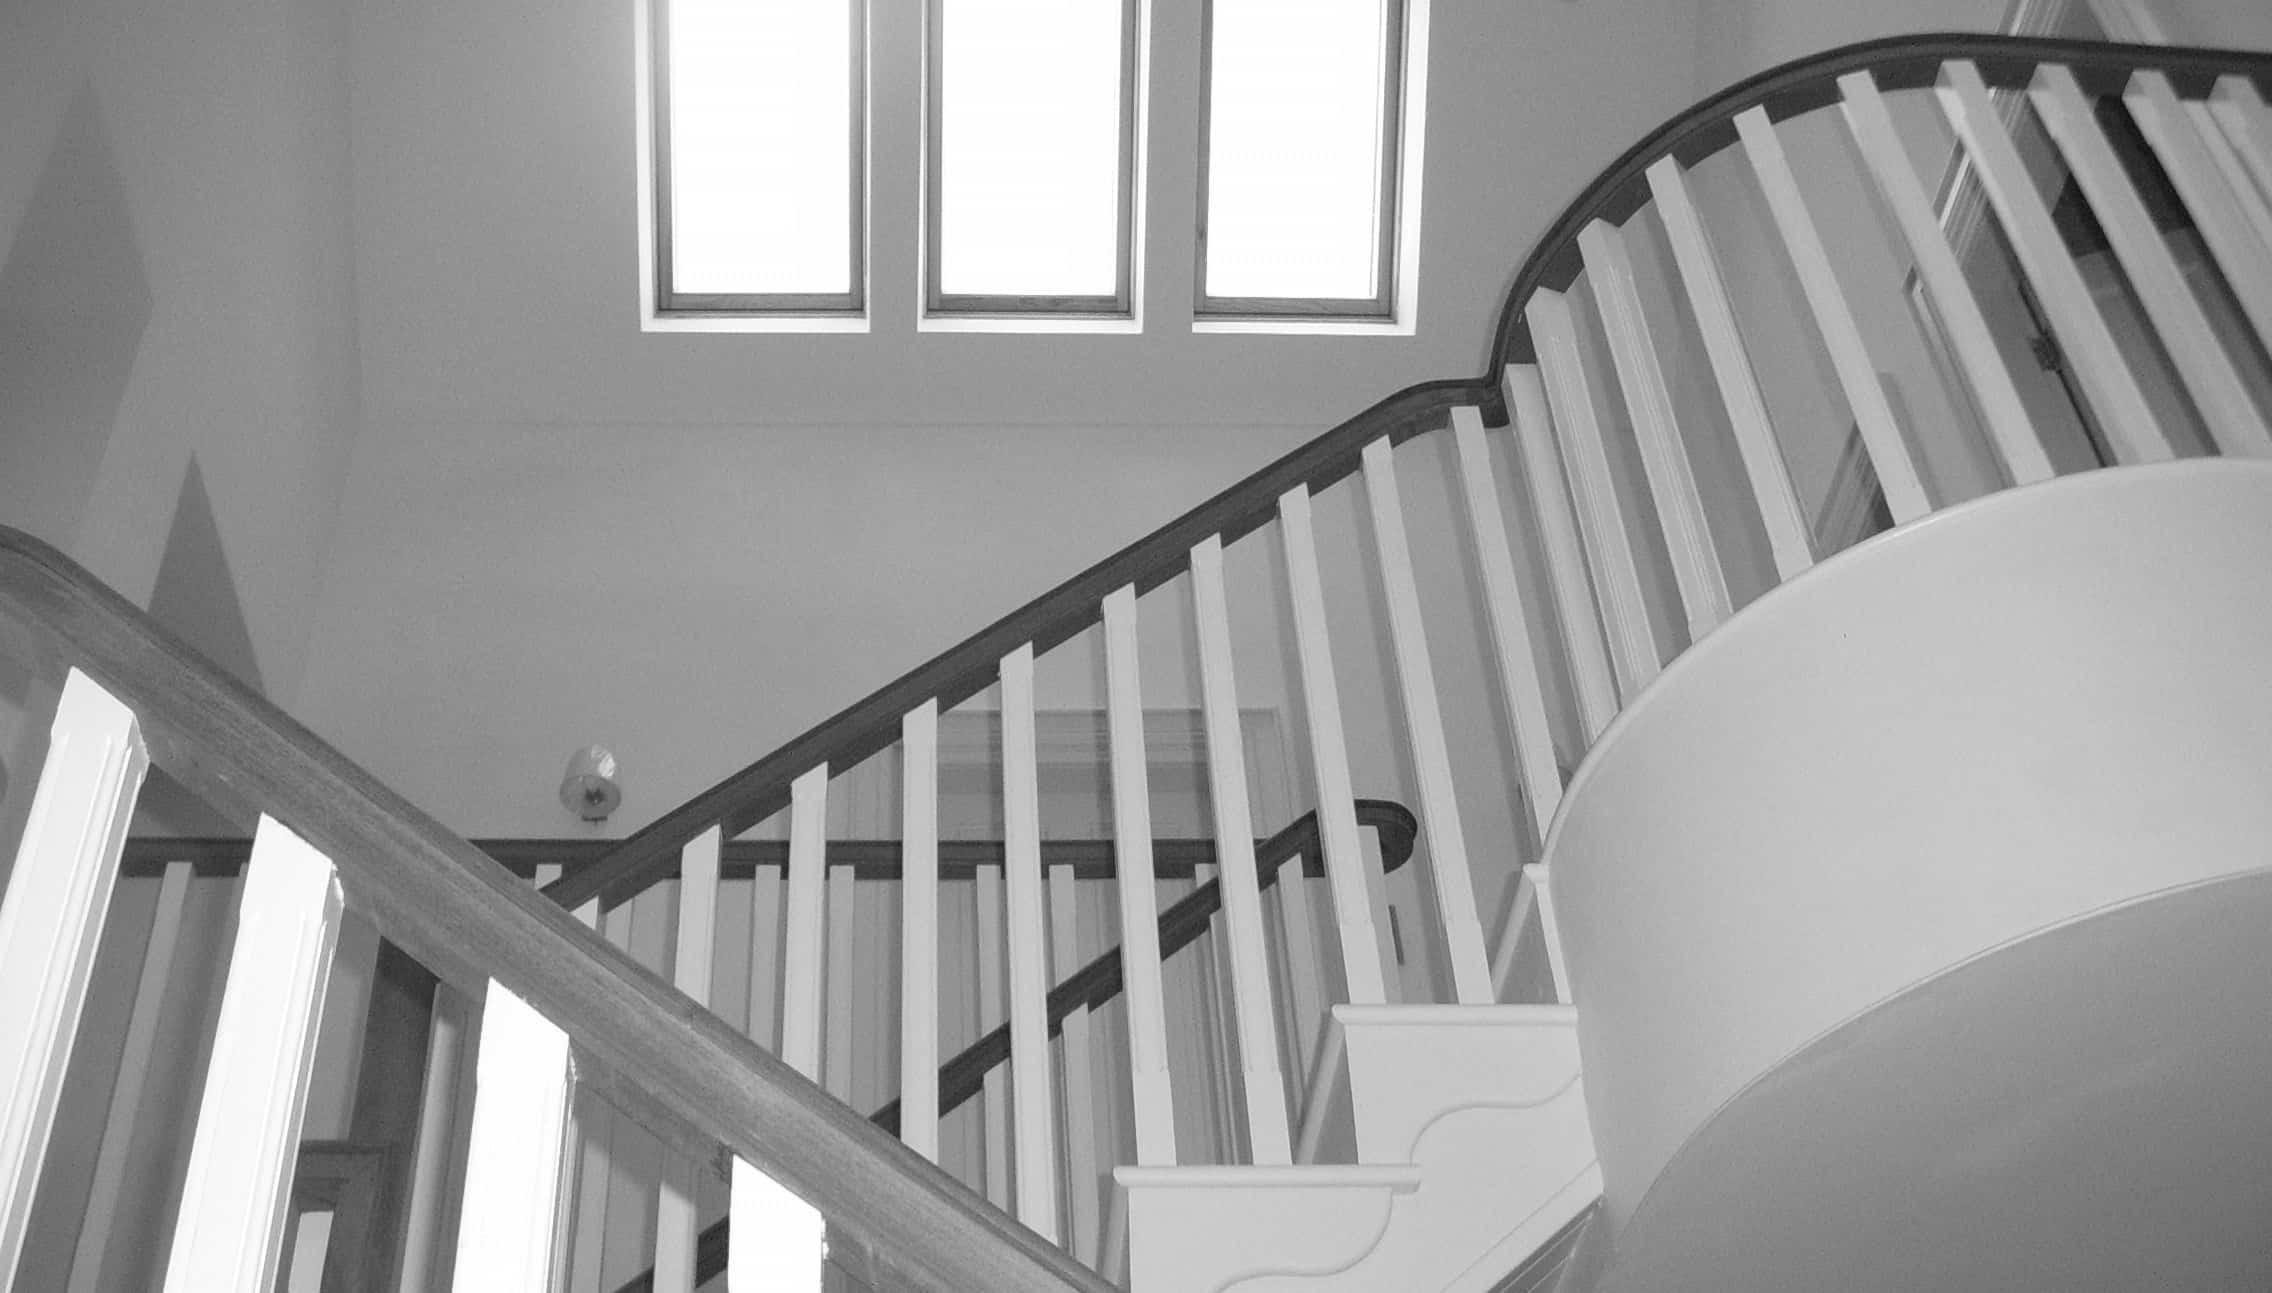 Wilson Dwelling - Internal Stair View